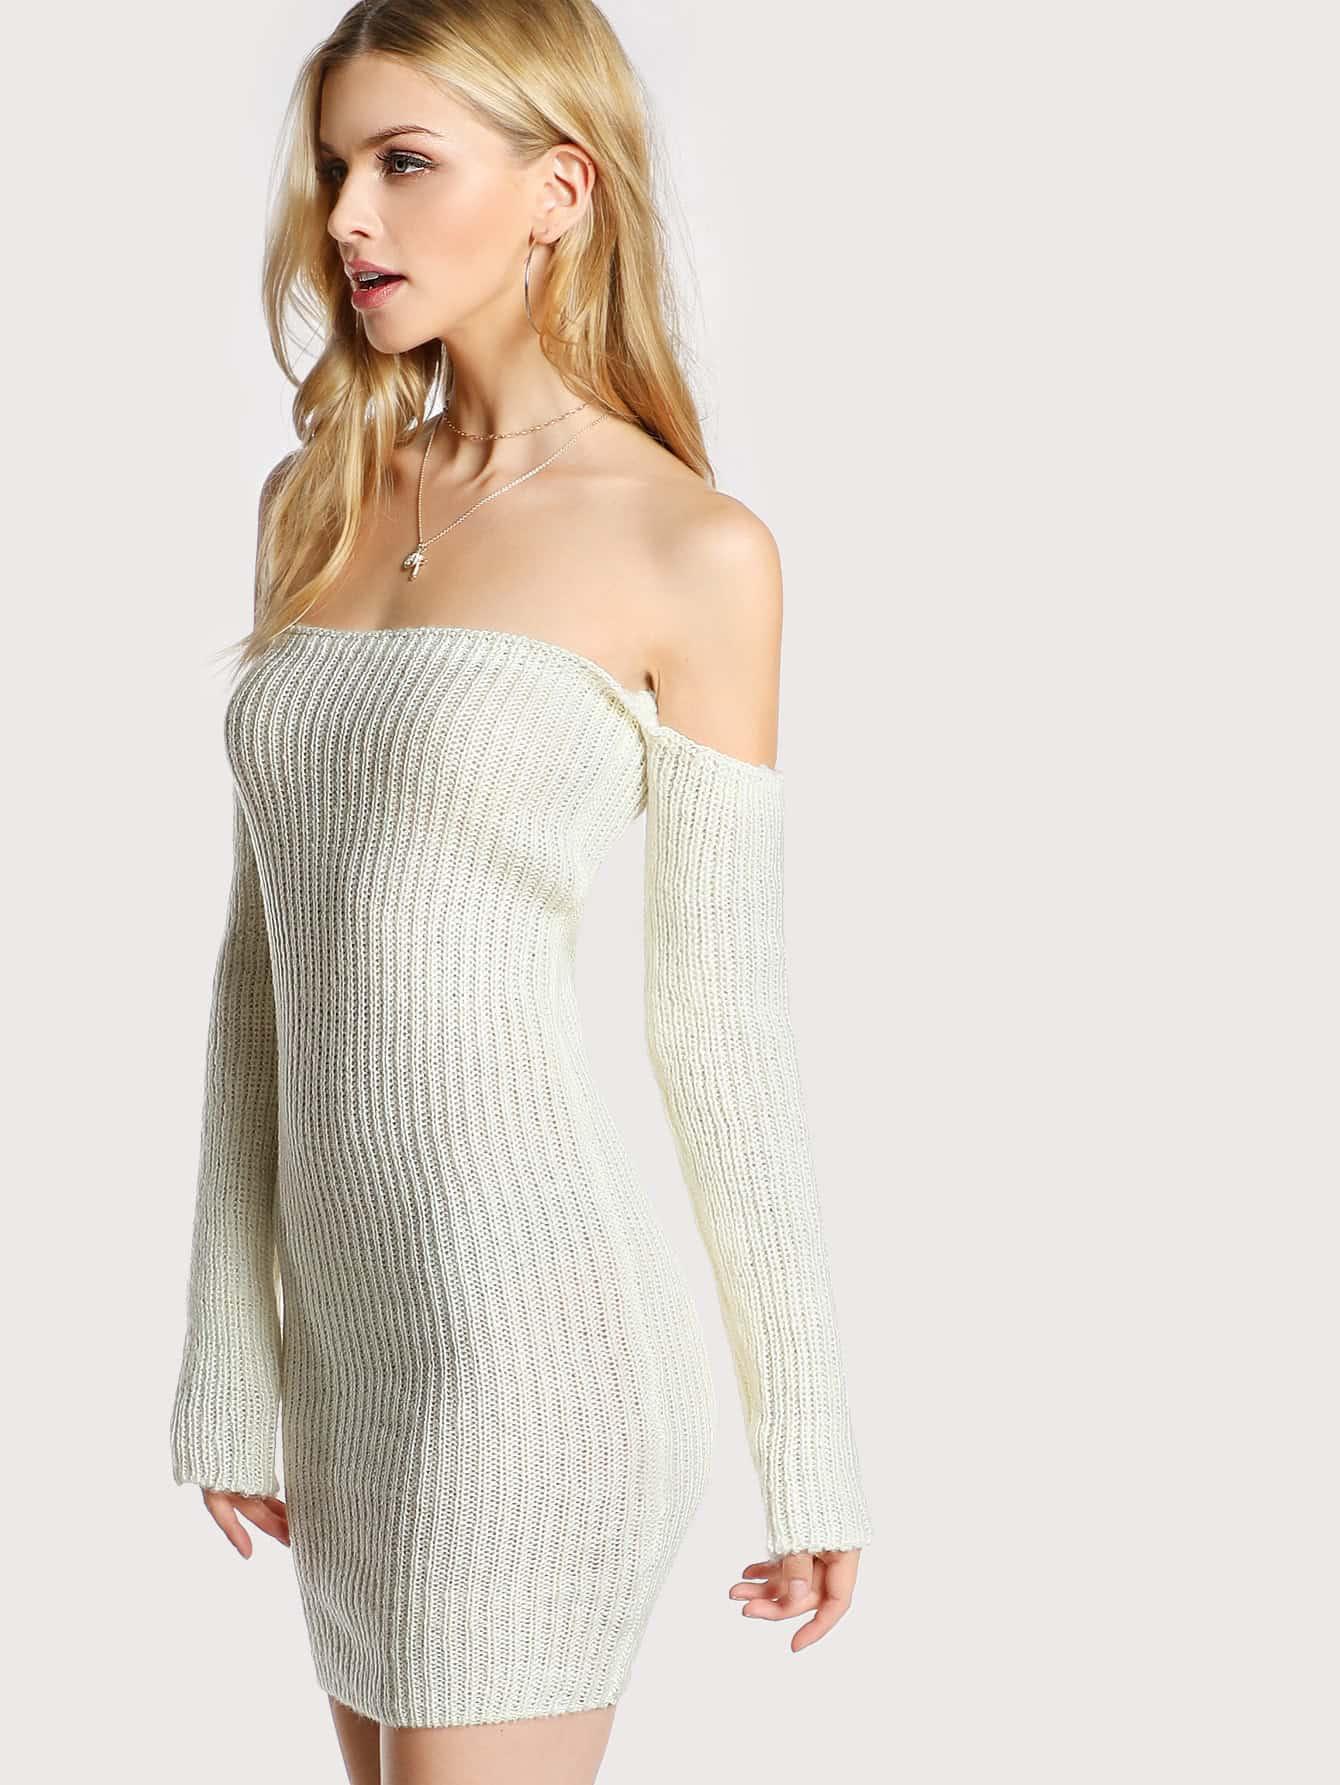 Off Shoulder Long Sleeve Sweater Dress WHITE -SheIn(Sheinside)